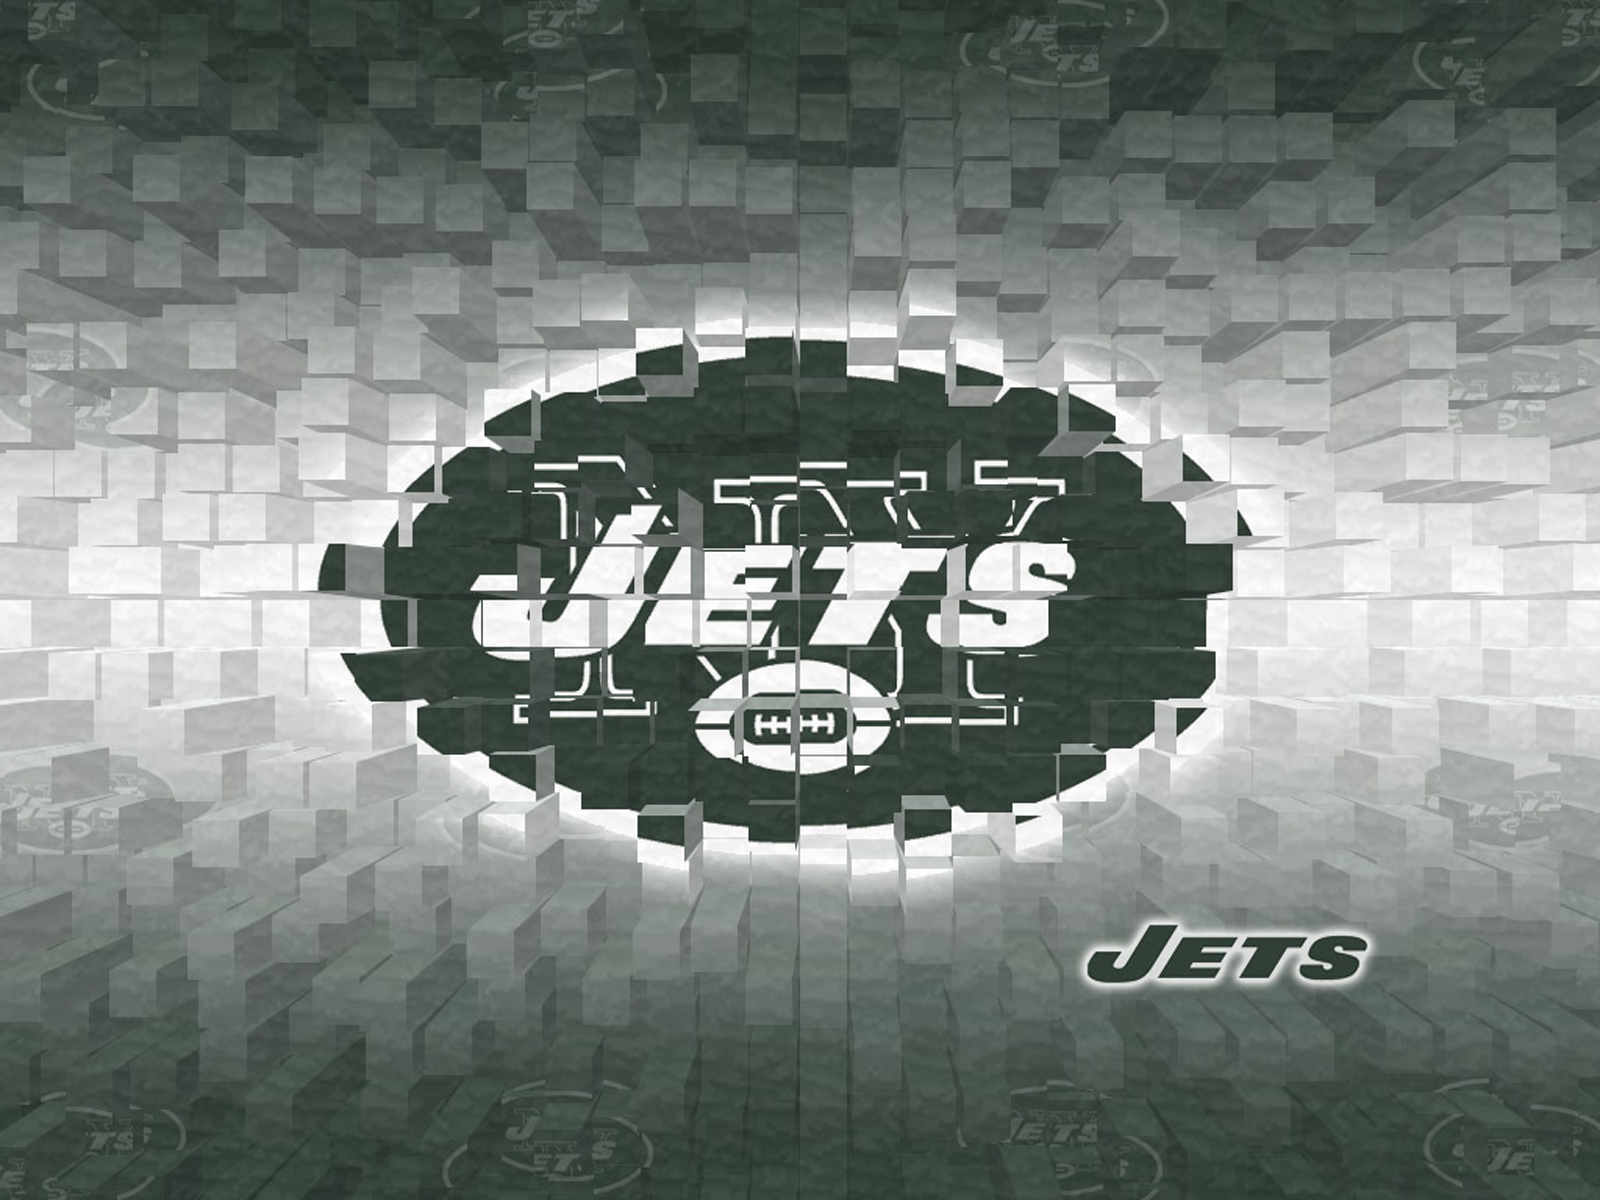 football wallpapers new york jet 39 s wallpaper